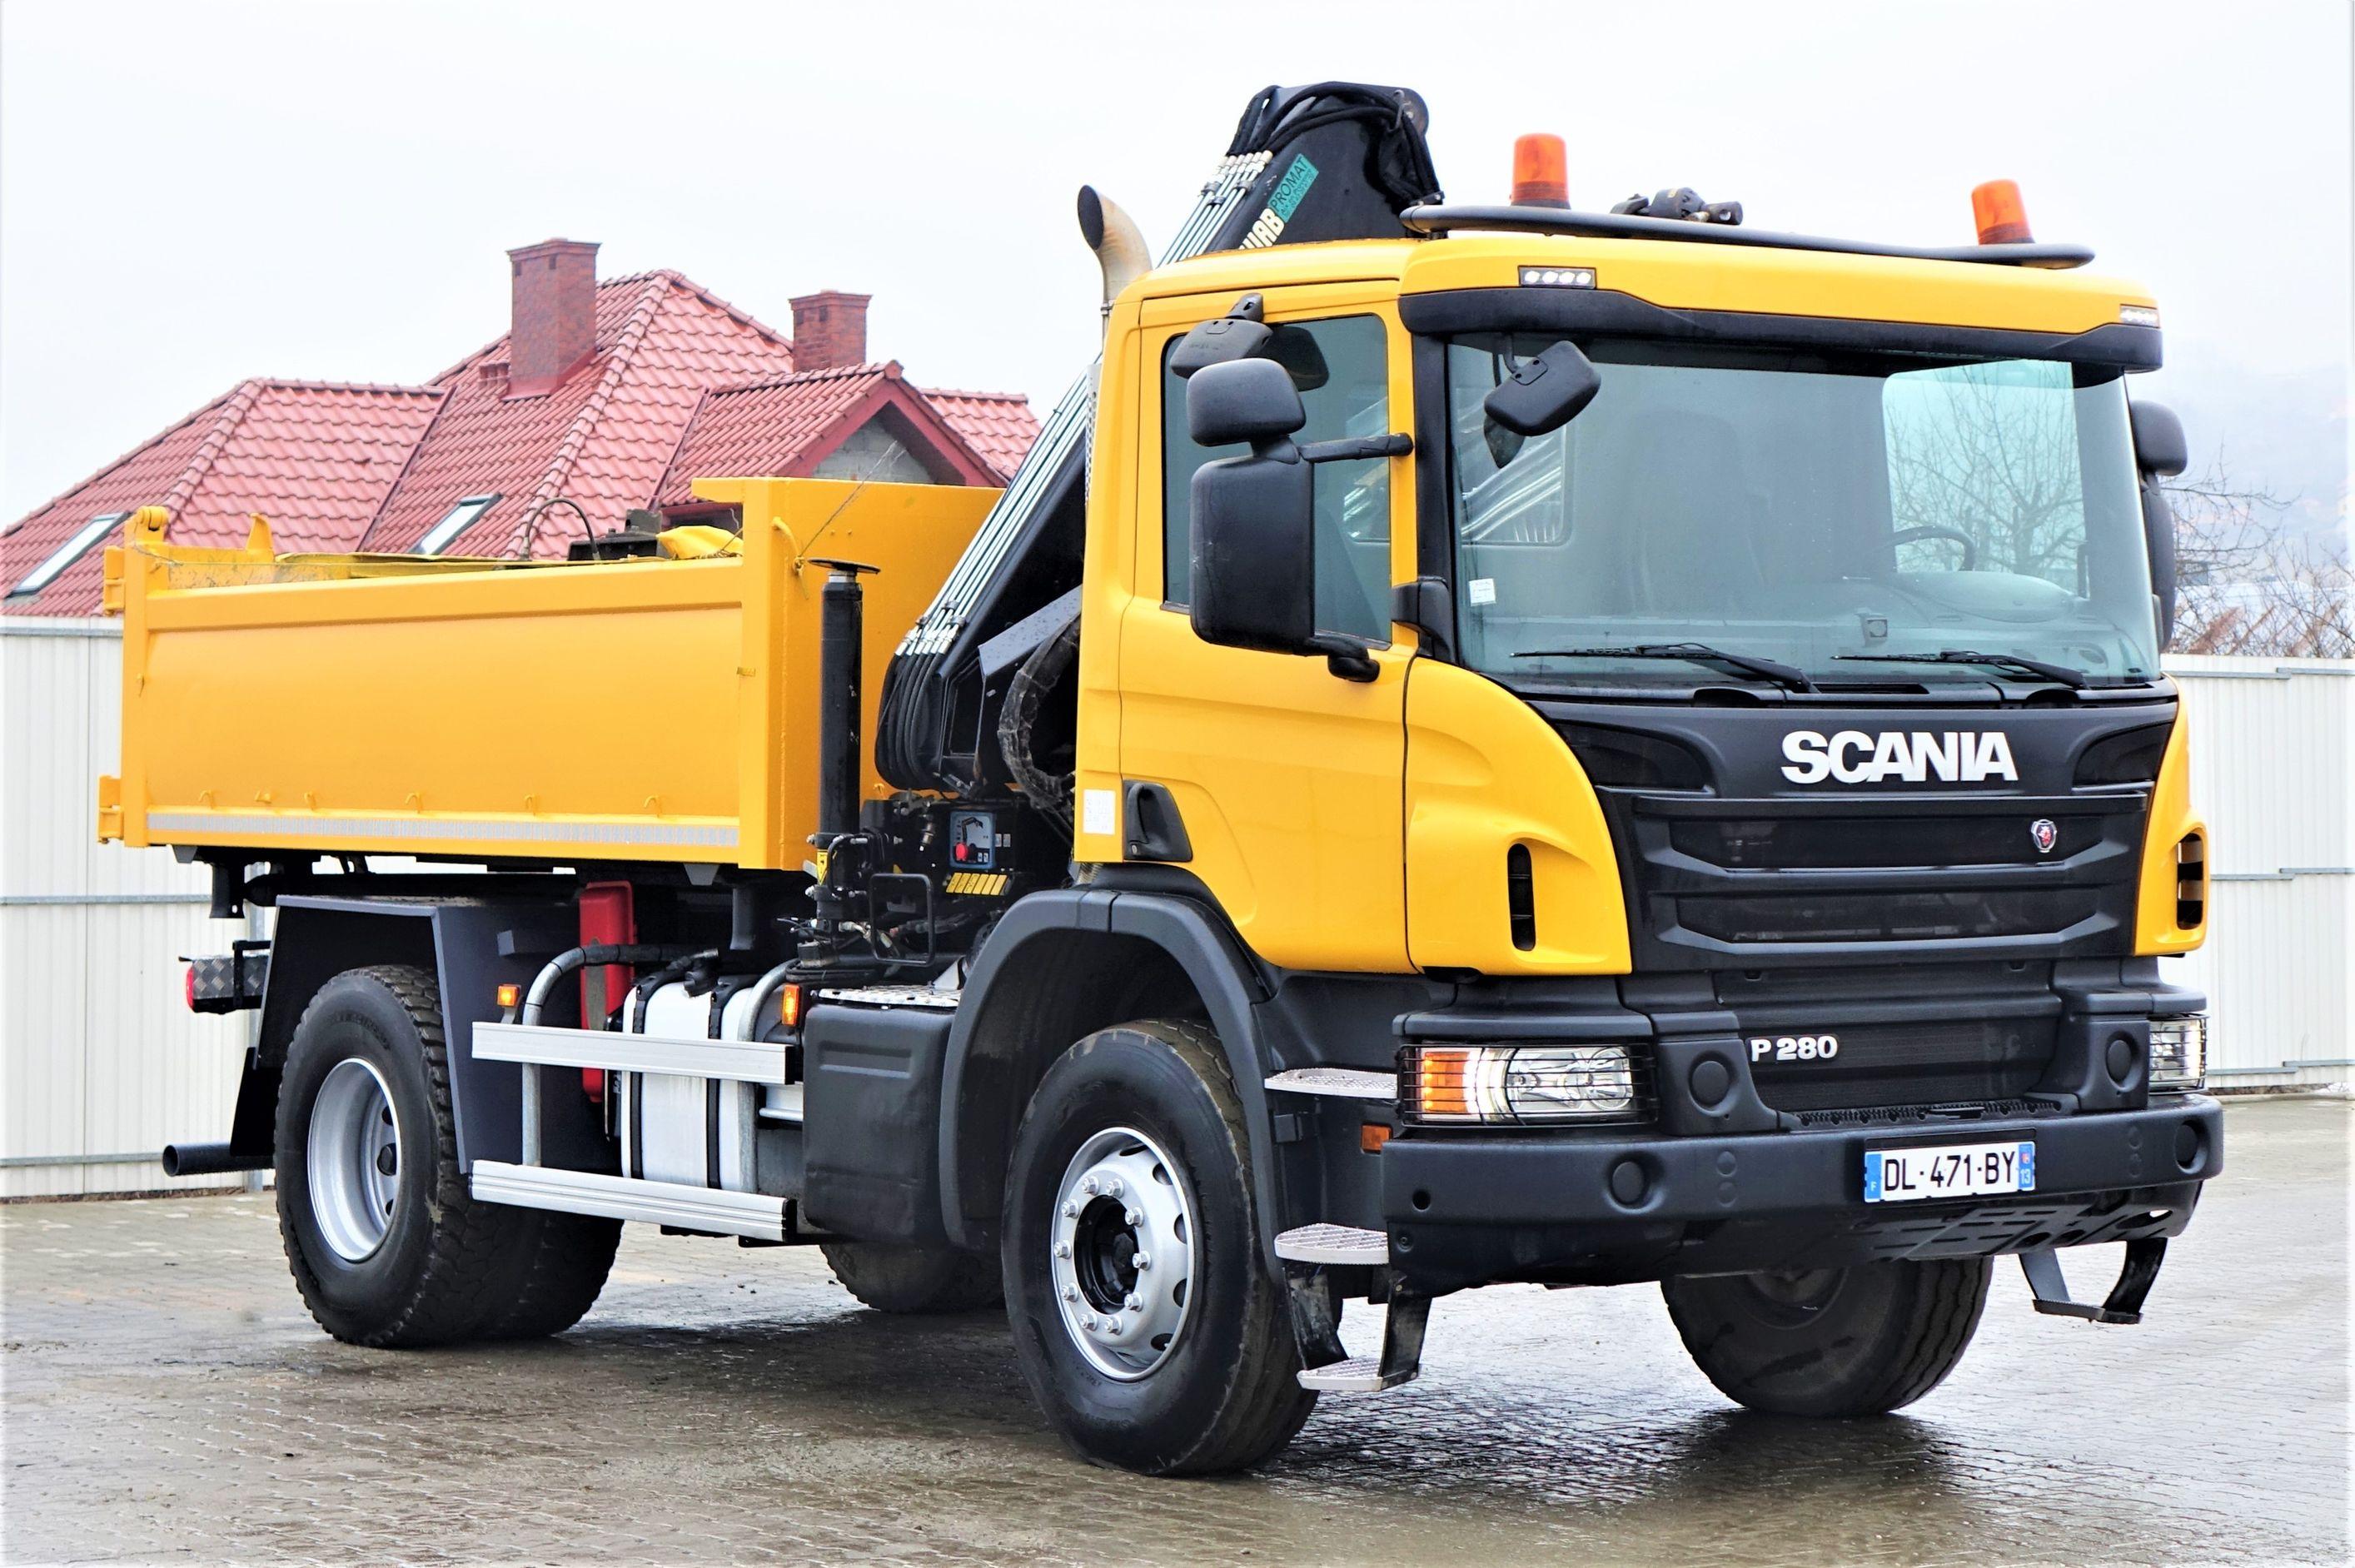 2015-scania-p280-17709122